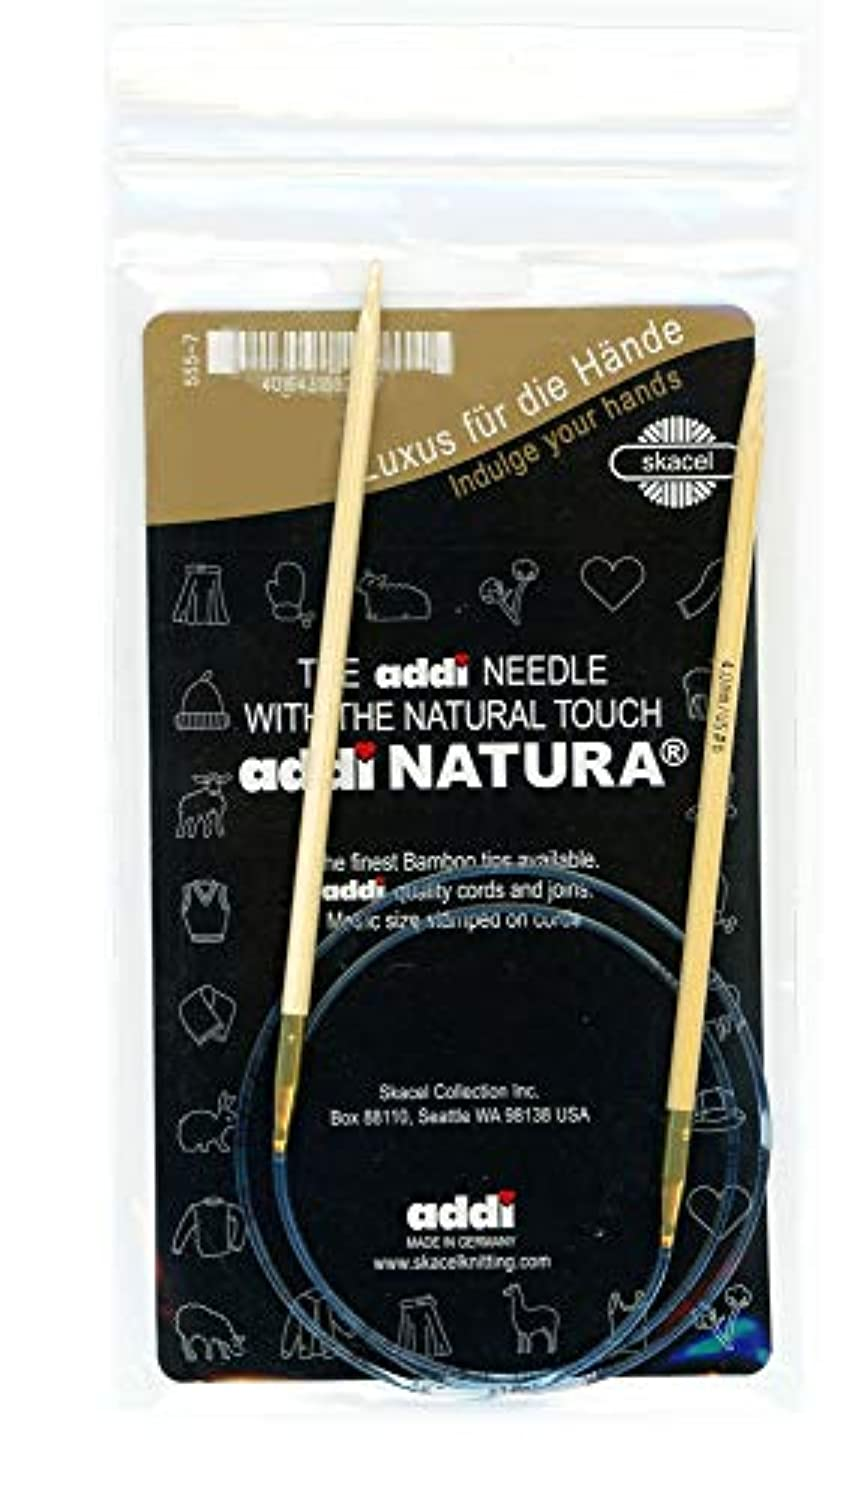 addi Knitting Needle Circular Natura Bamboo Skacel Exclusive Blue Cord 20 inch (50cm) Size US 06 (4.0mm)